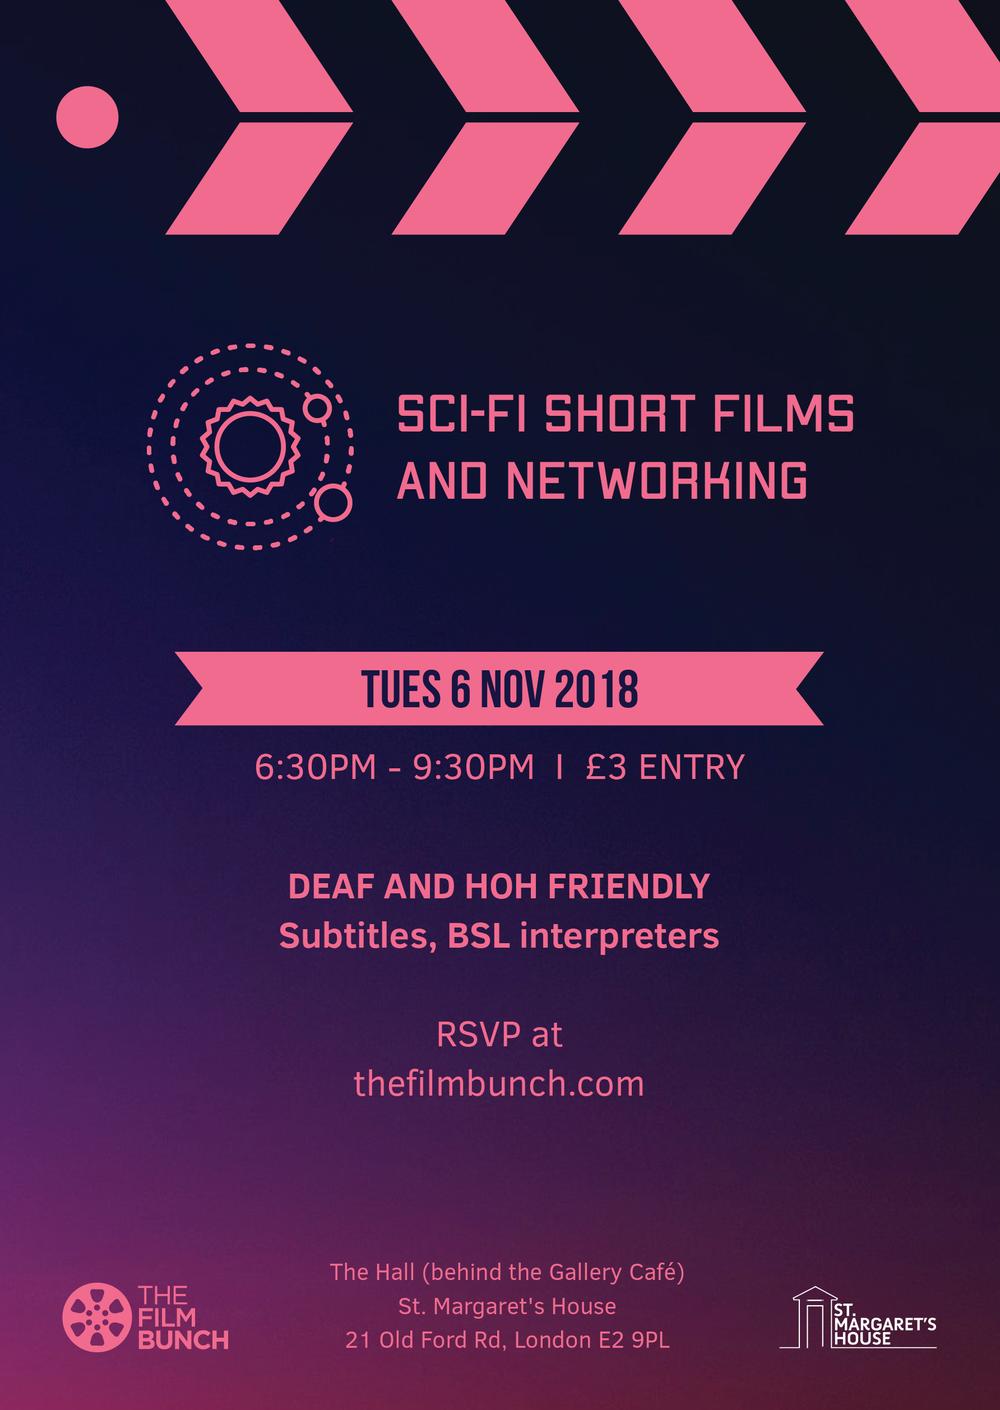 TheFilmBunch_EventFlyer_Nov2018.png